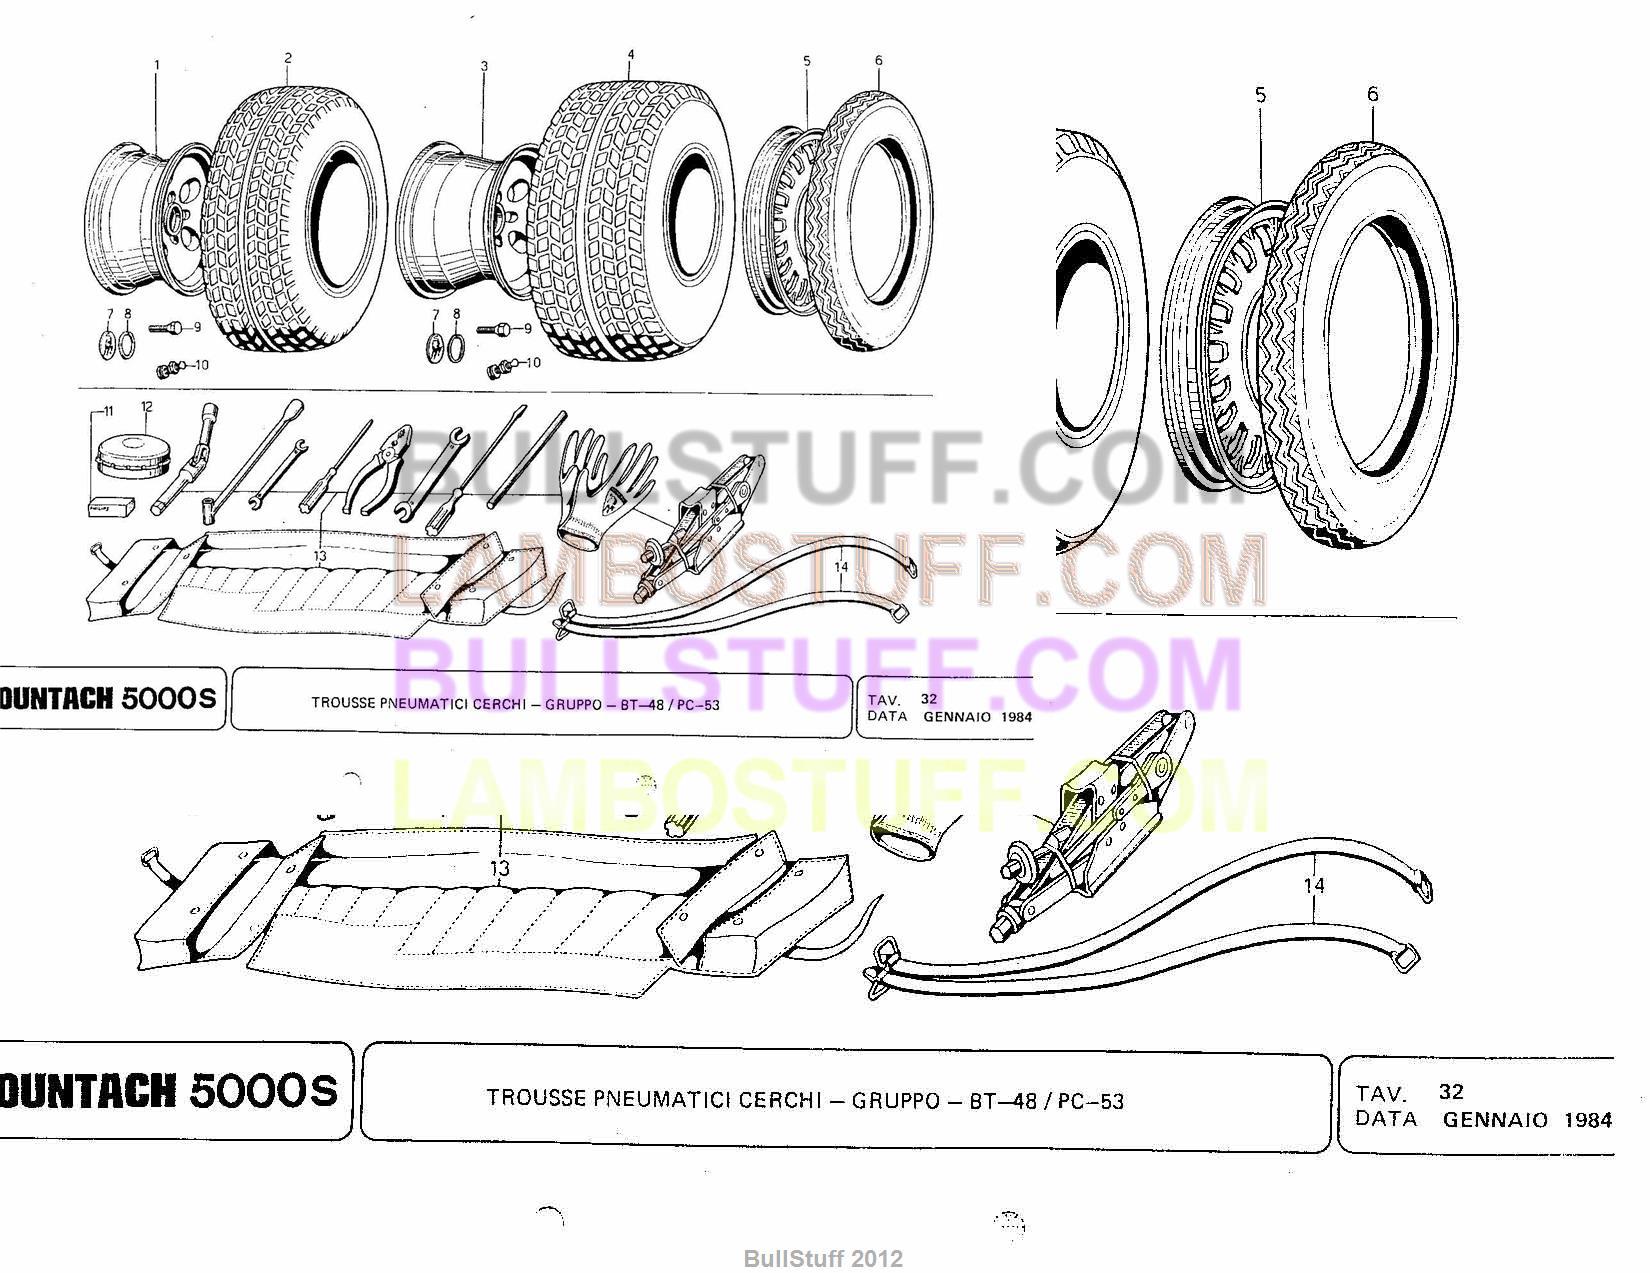 1984 Lamborghini Countach 5000s USA Tool Kit Tires and Rims 32 – Lamborghini Countach Wiring Diagram